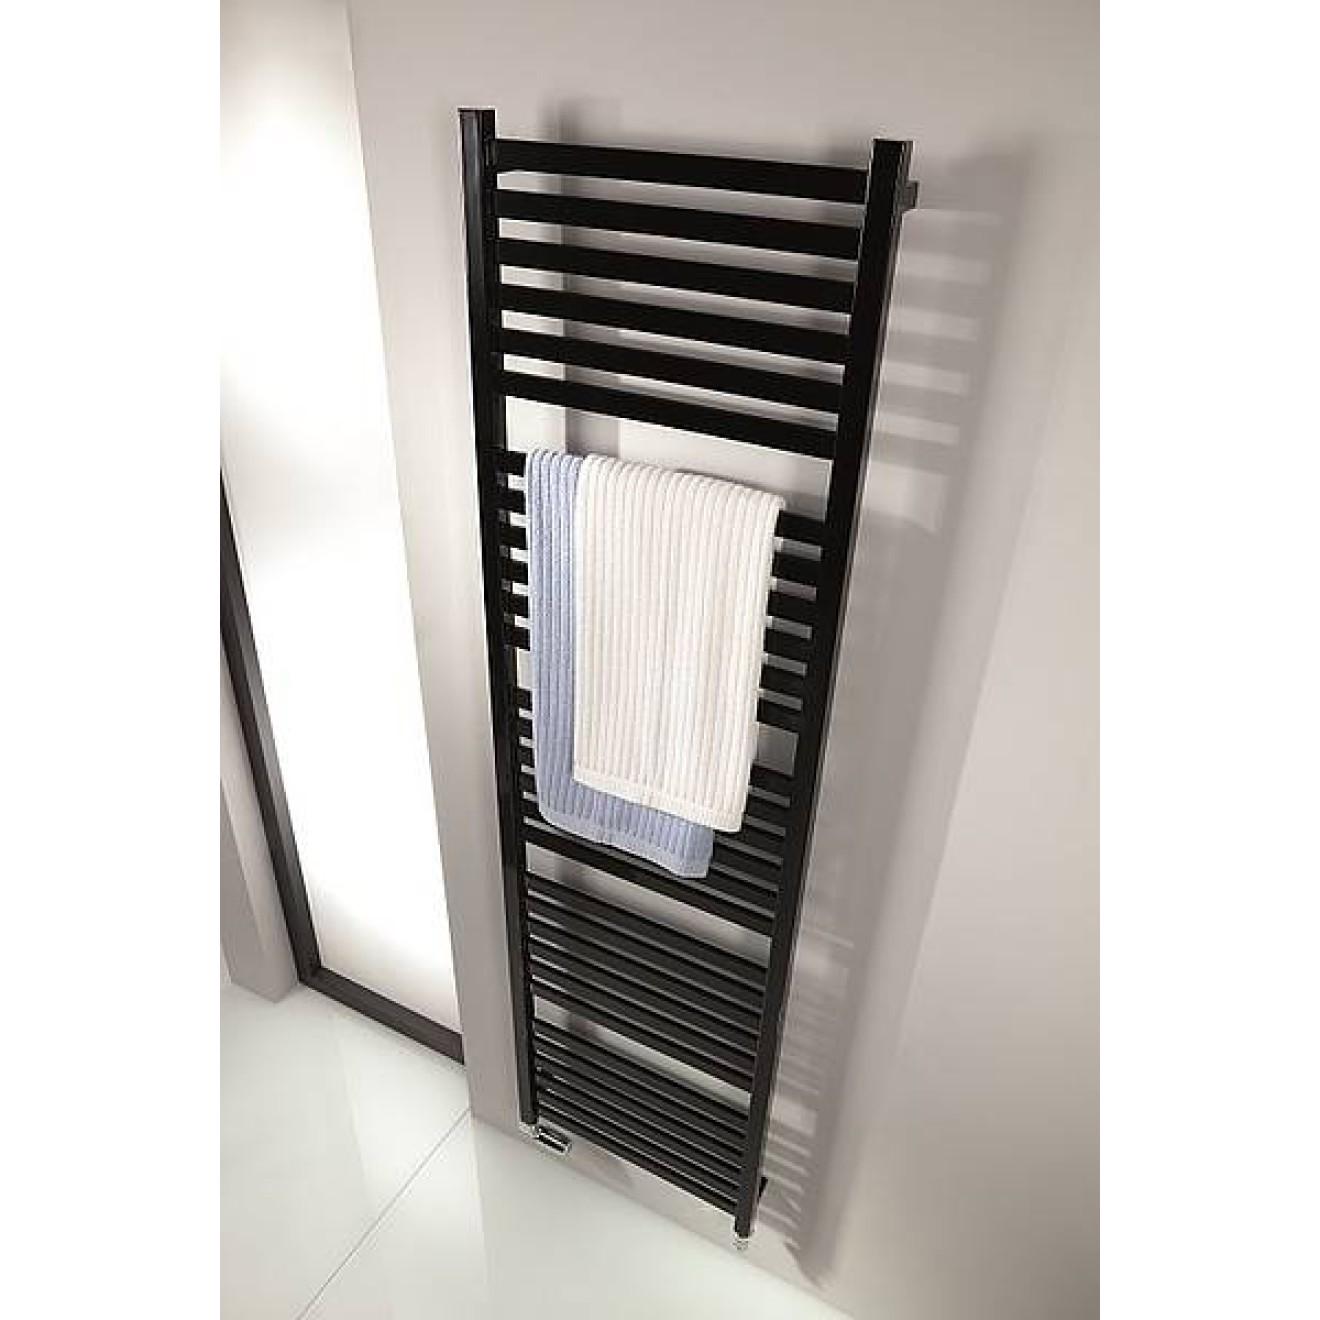 badheizk rper line aero 600 x 1800 mm treffpunkt bad der shop f r das moderne bad. Black Bedroom Furniture Sets. Home Design Ideas